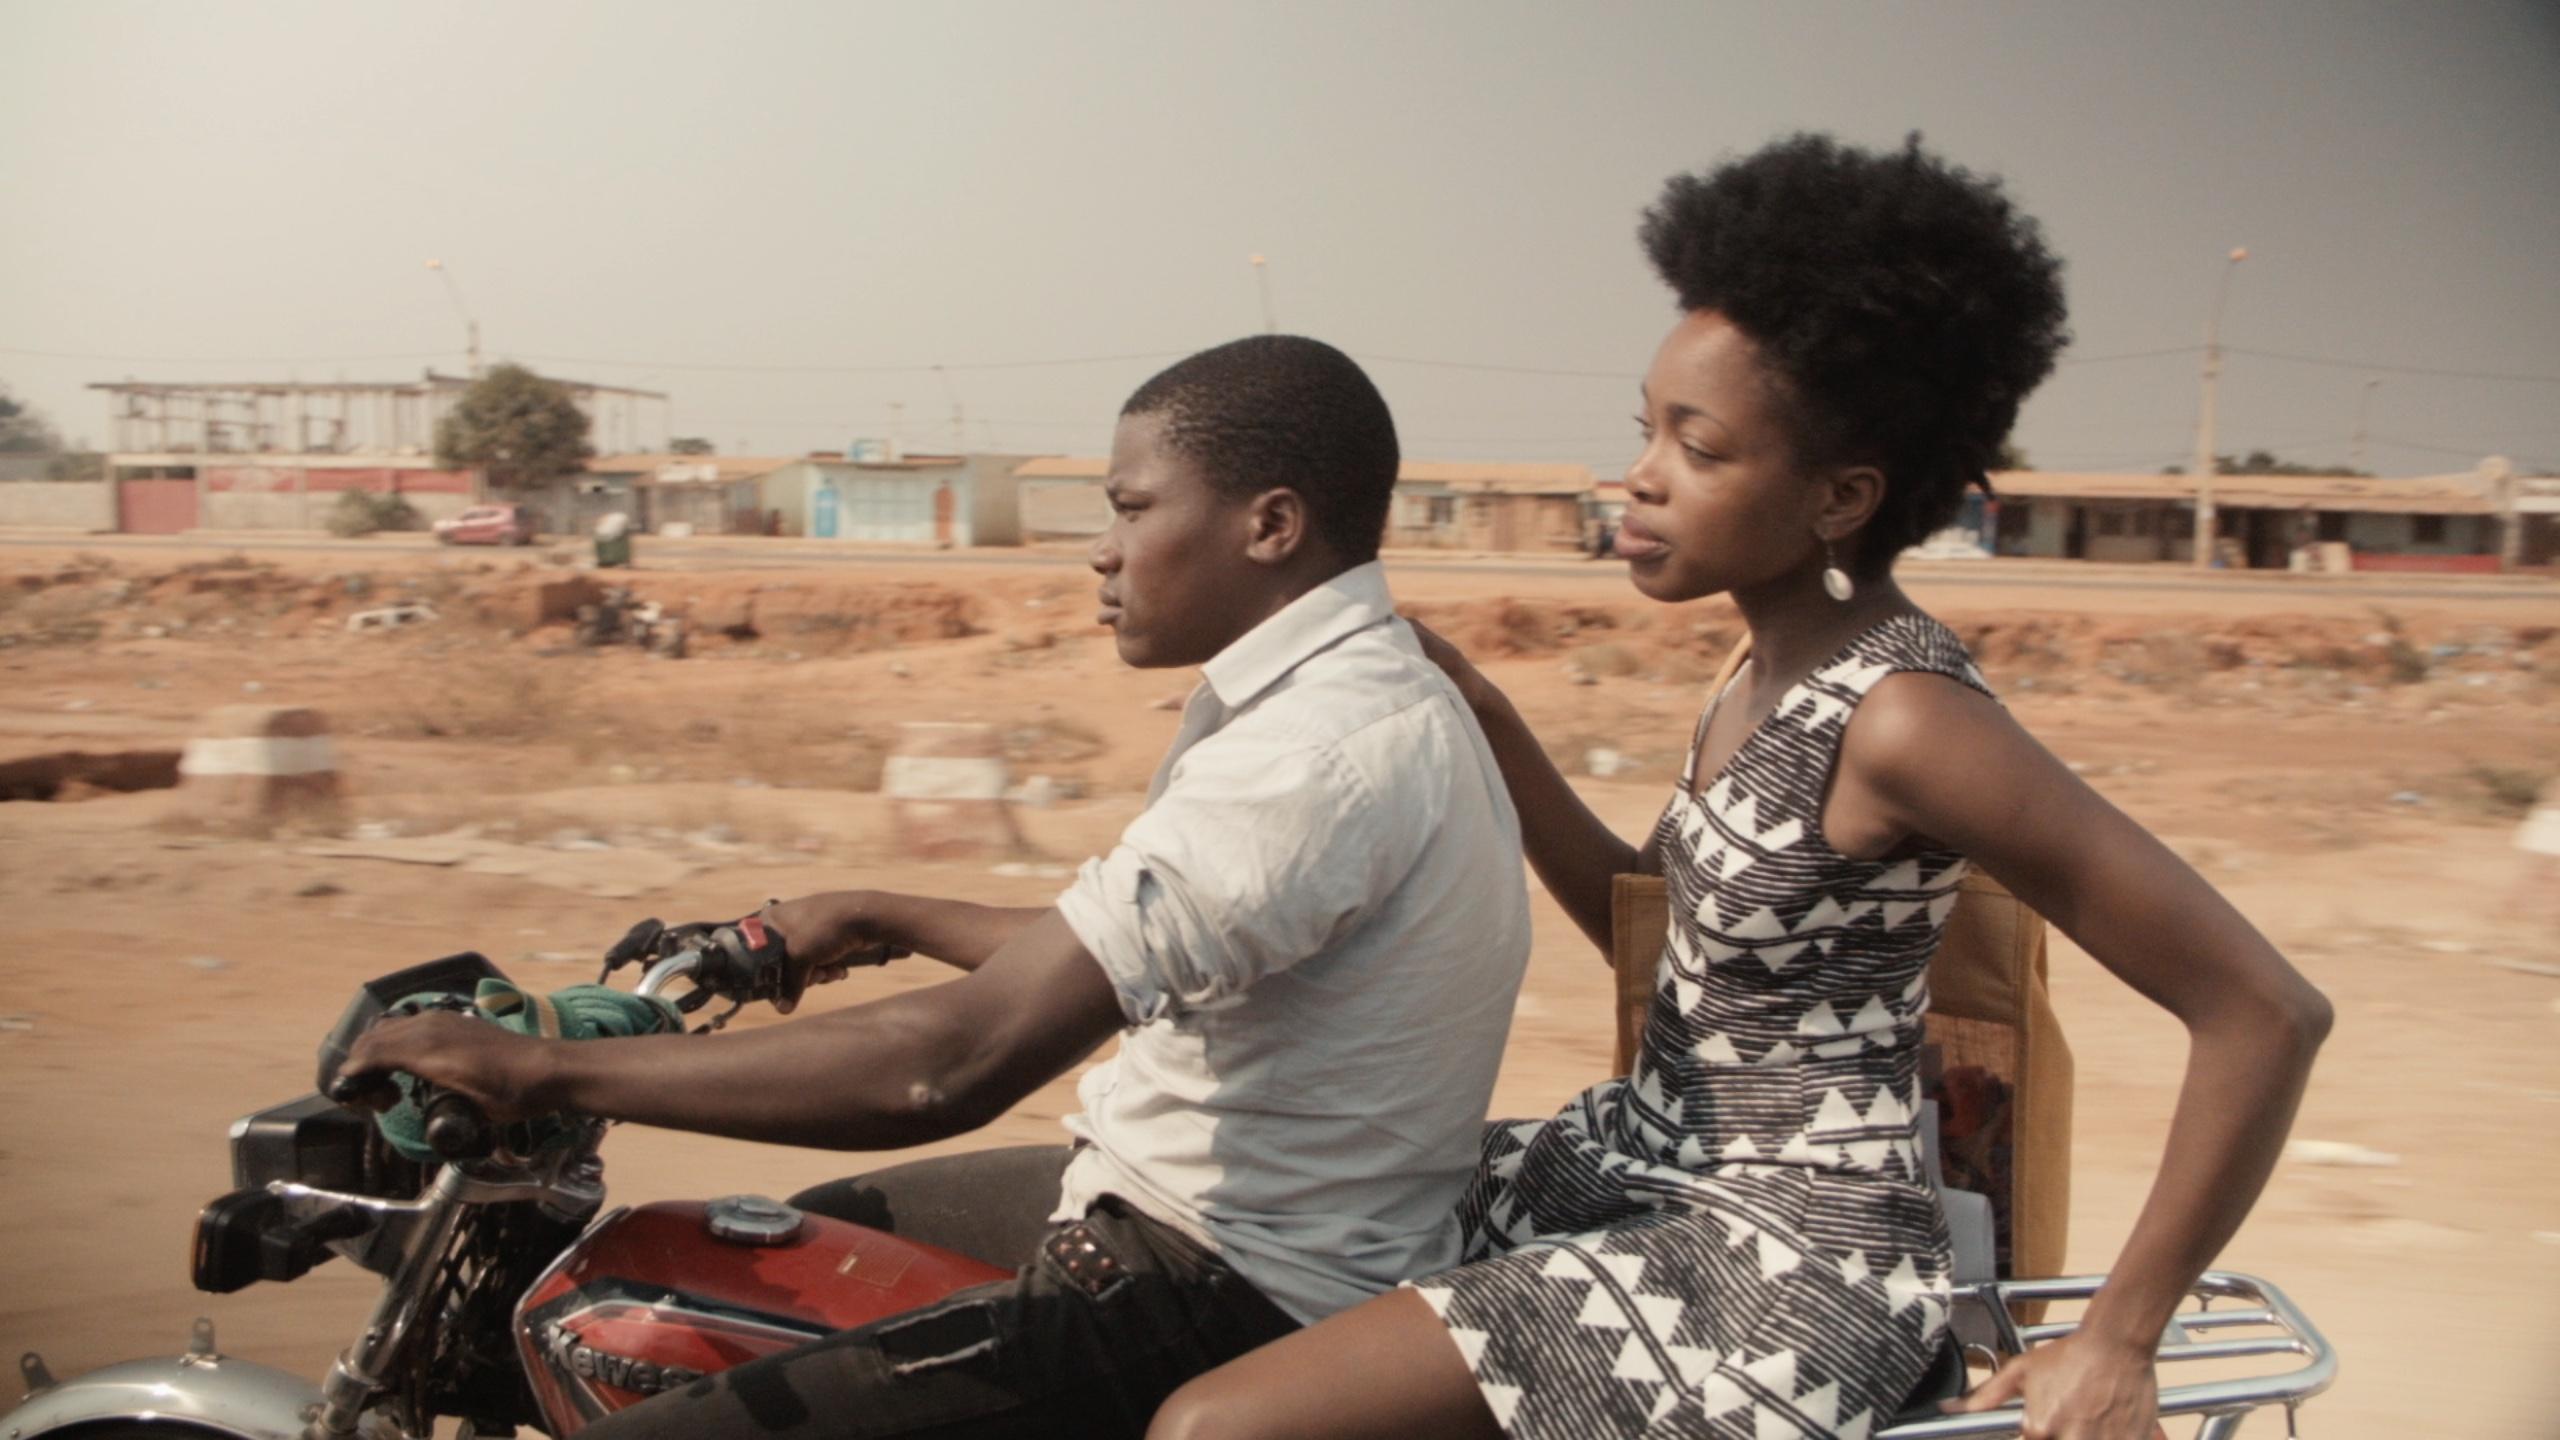 Lucia, Luanda (ANG)